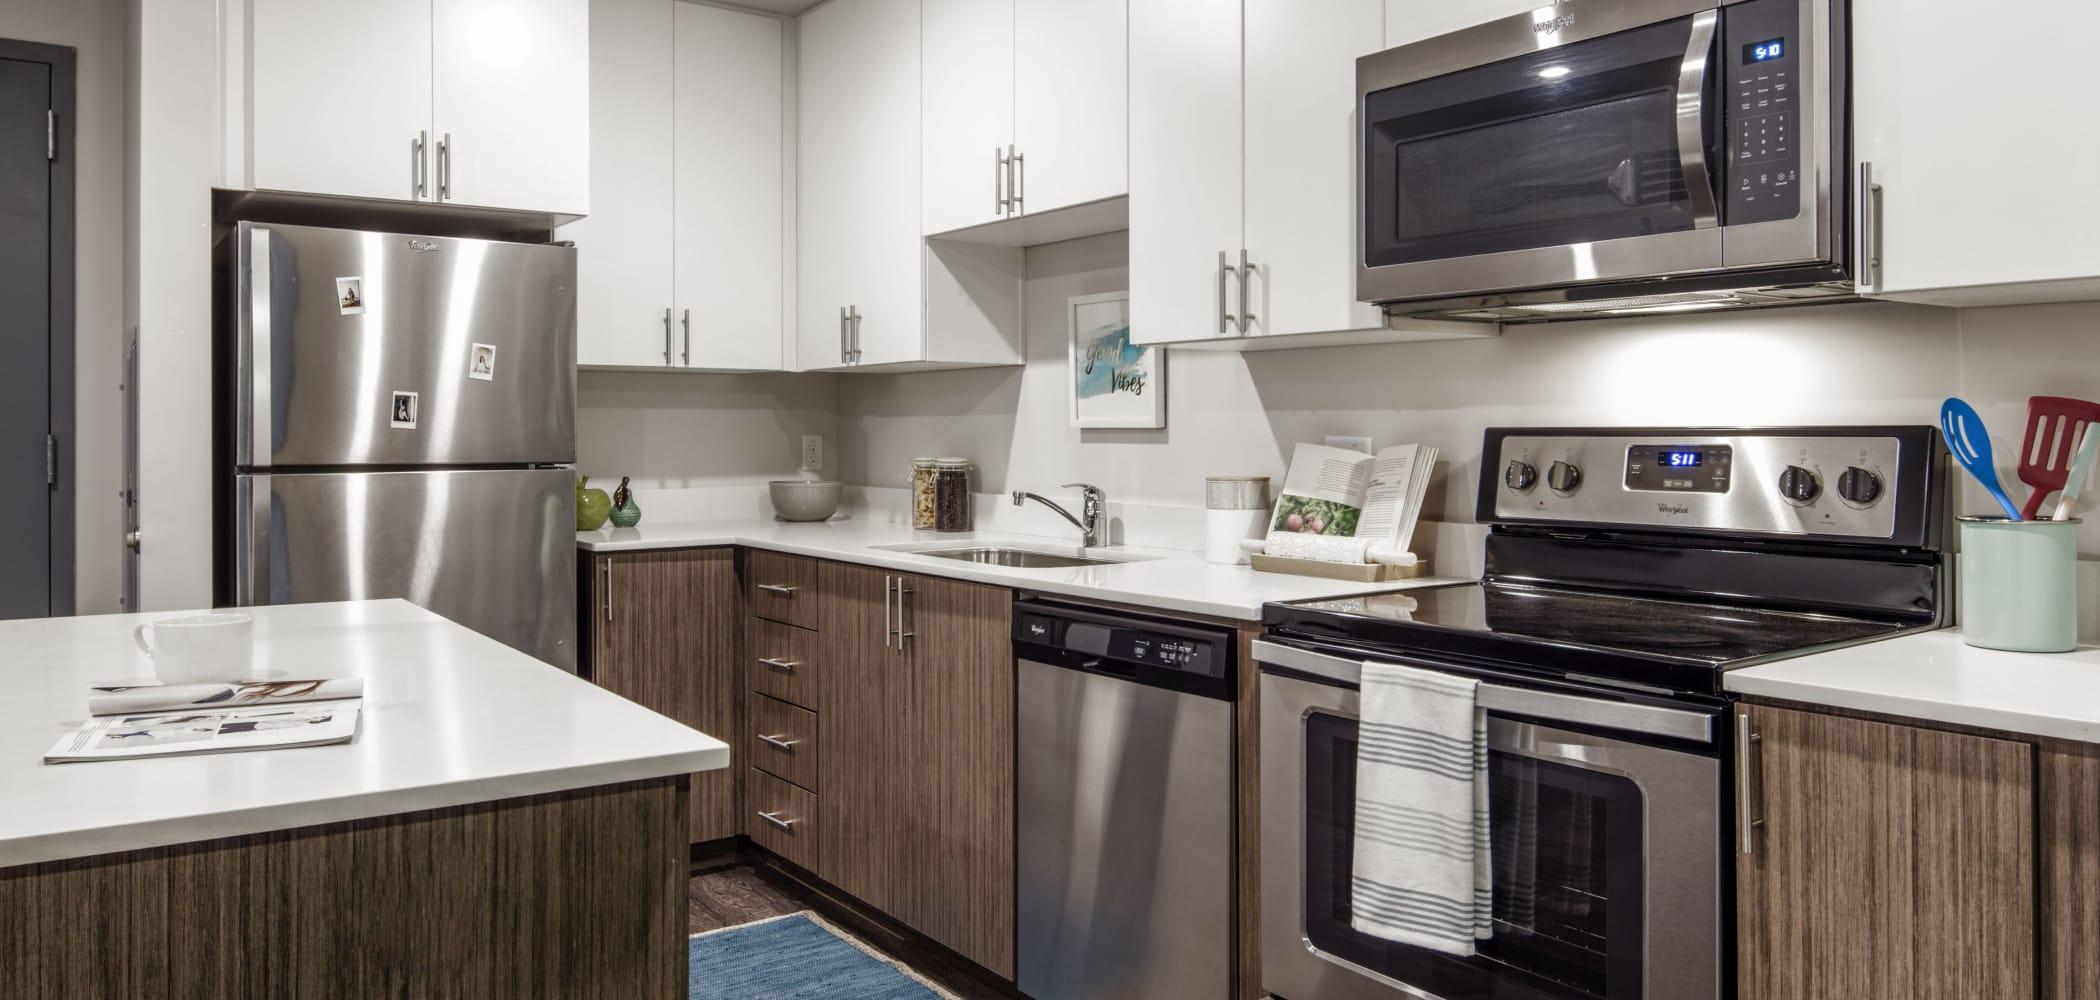 Sleek, modern kitchen at RISE on Apache in Tempe, Arizona